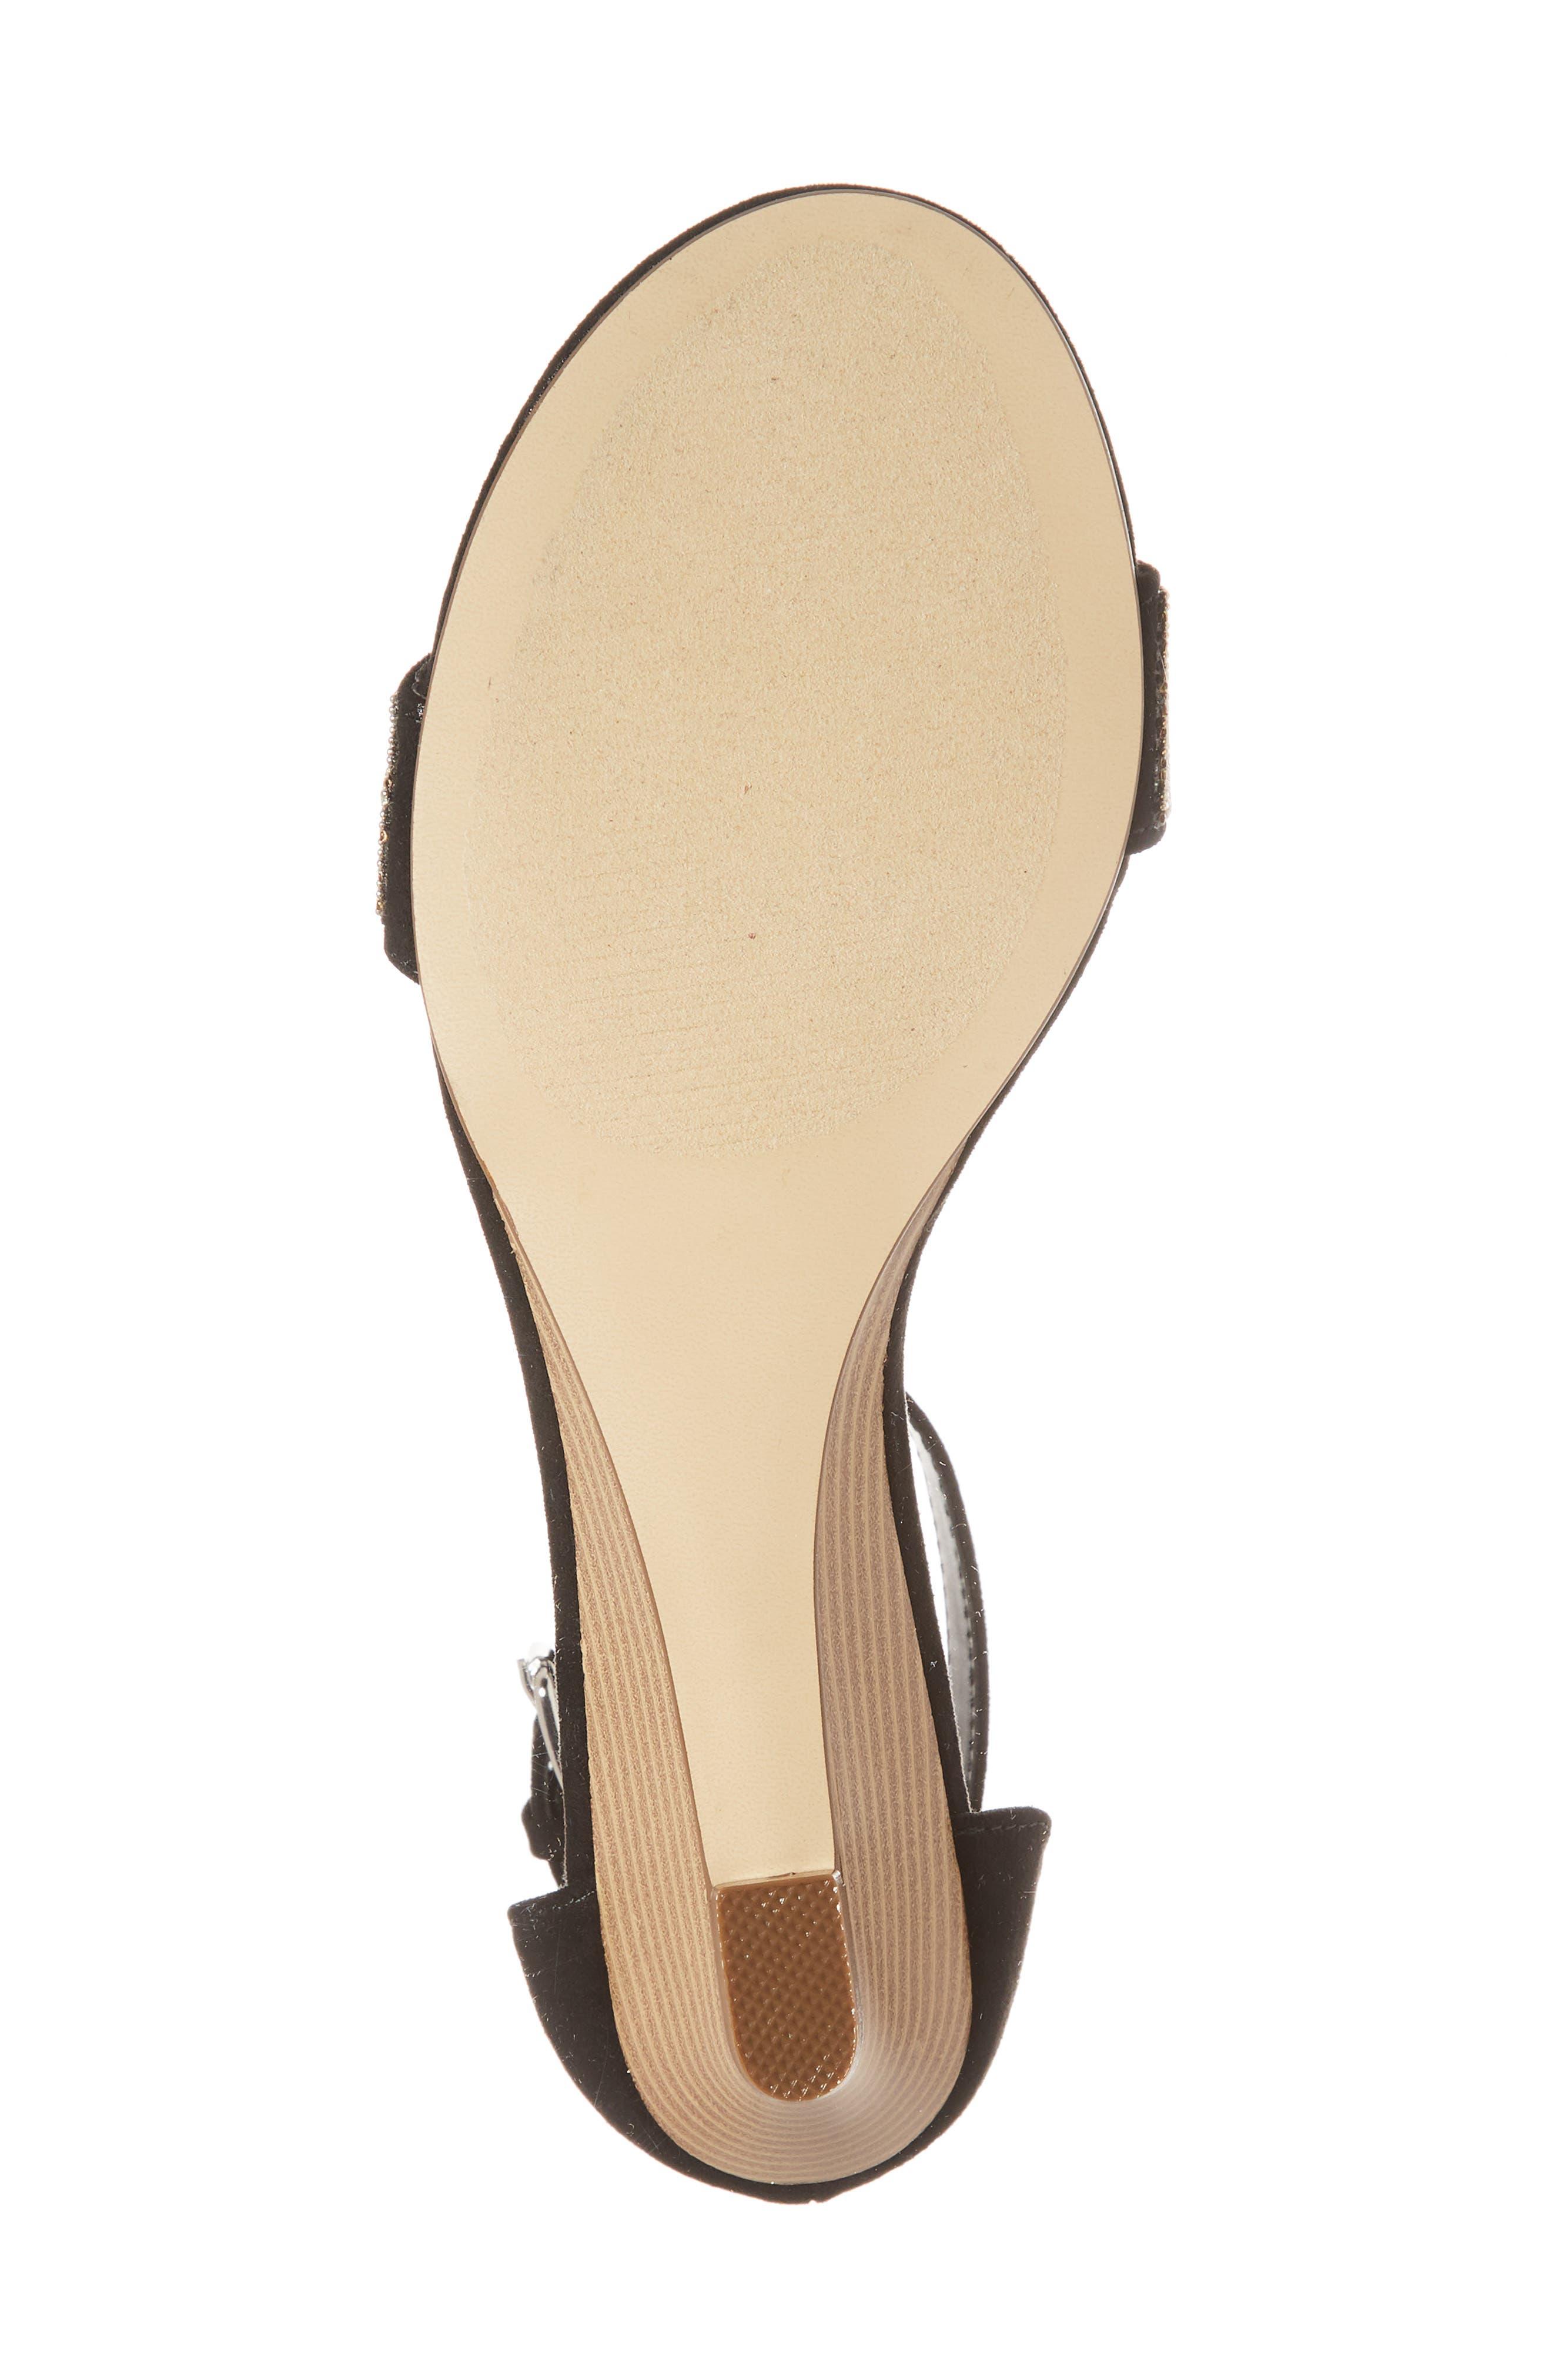 Enfield Ankle Strap Wedge Sandal,                             Alternate thumbnail 6, color,                             003